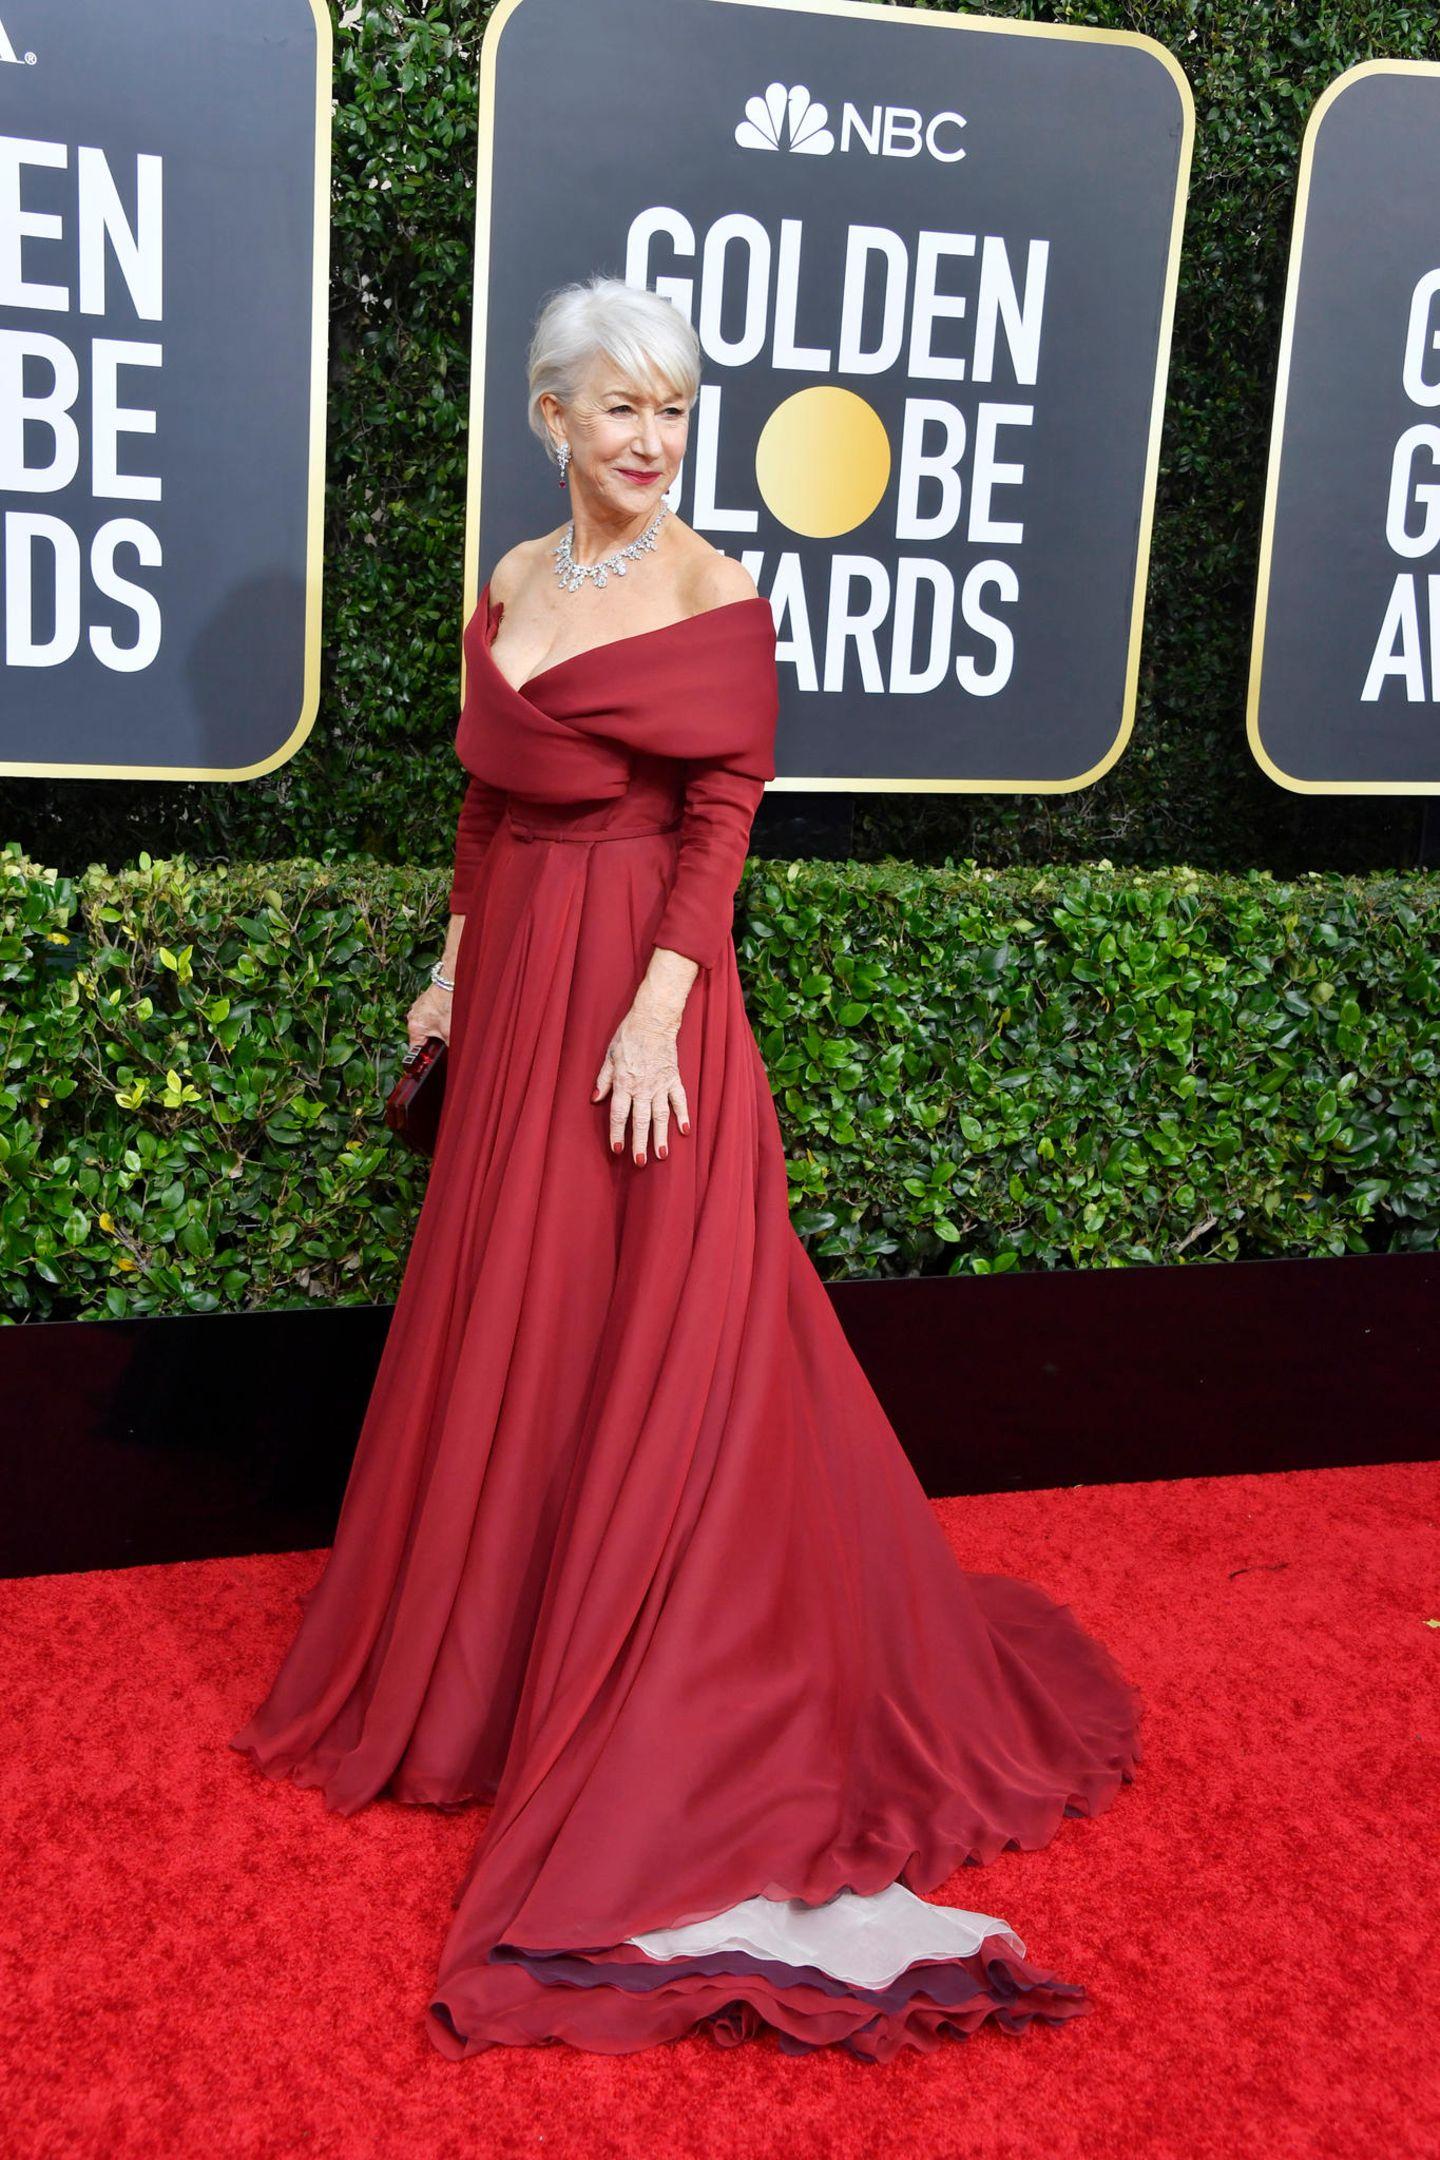 Golden Globes: Helen Mirren